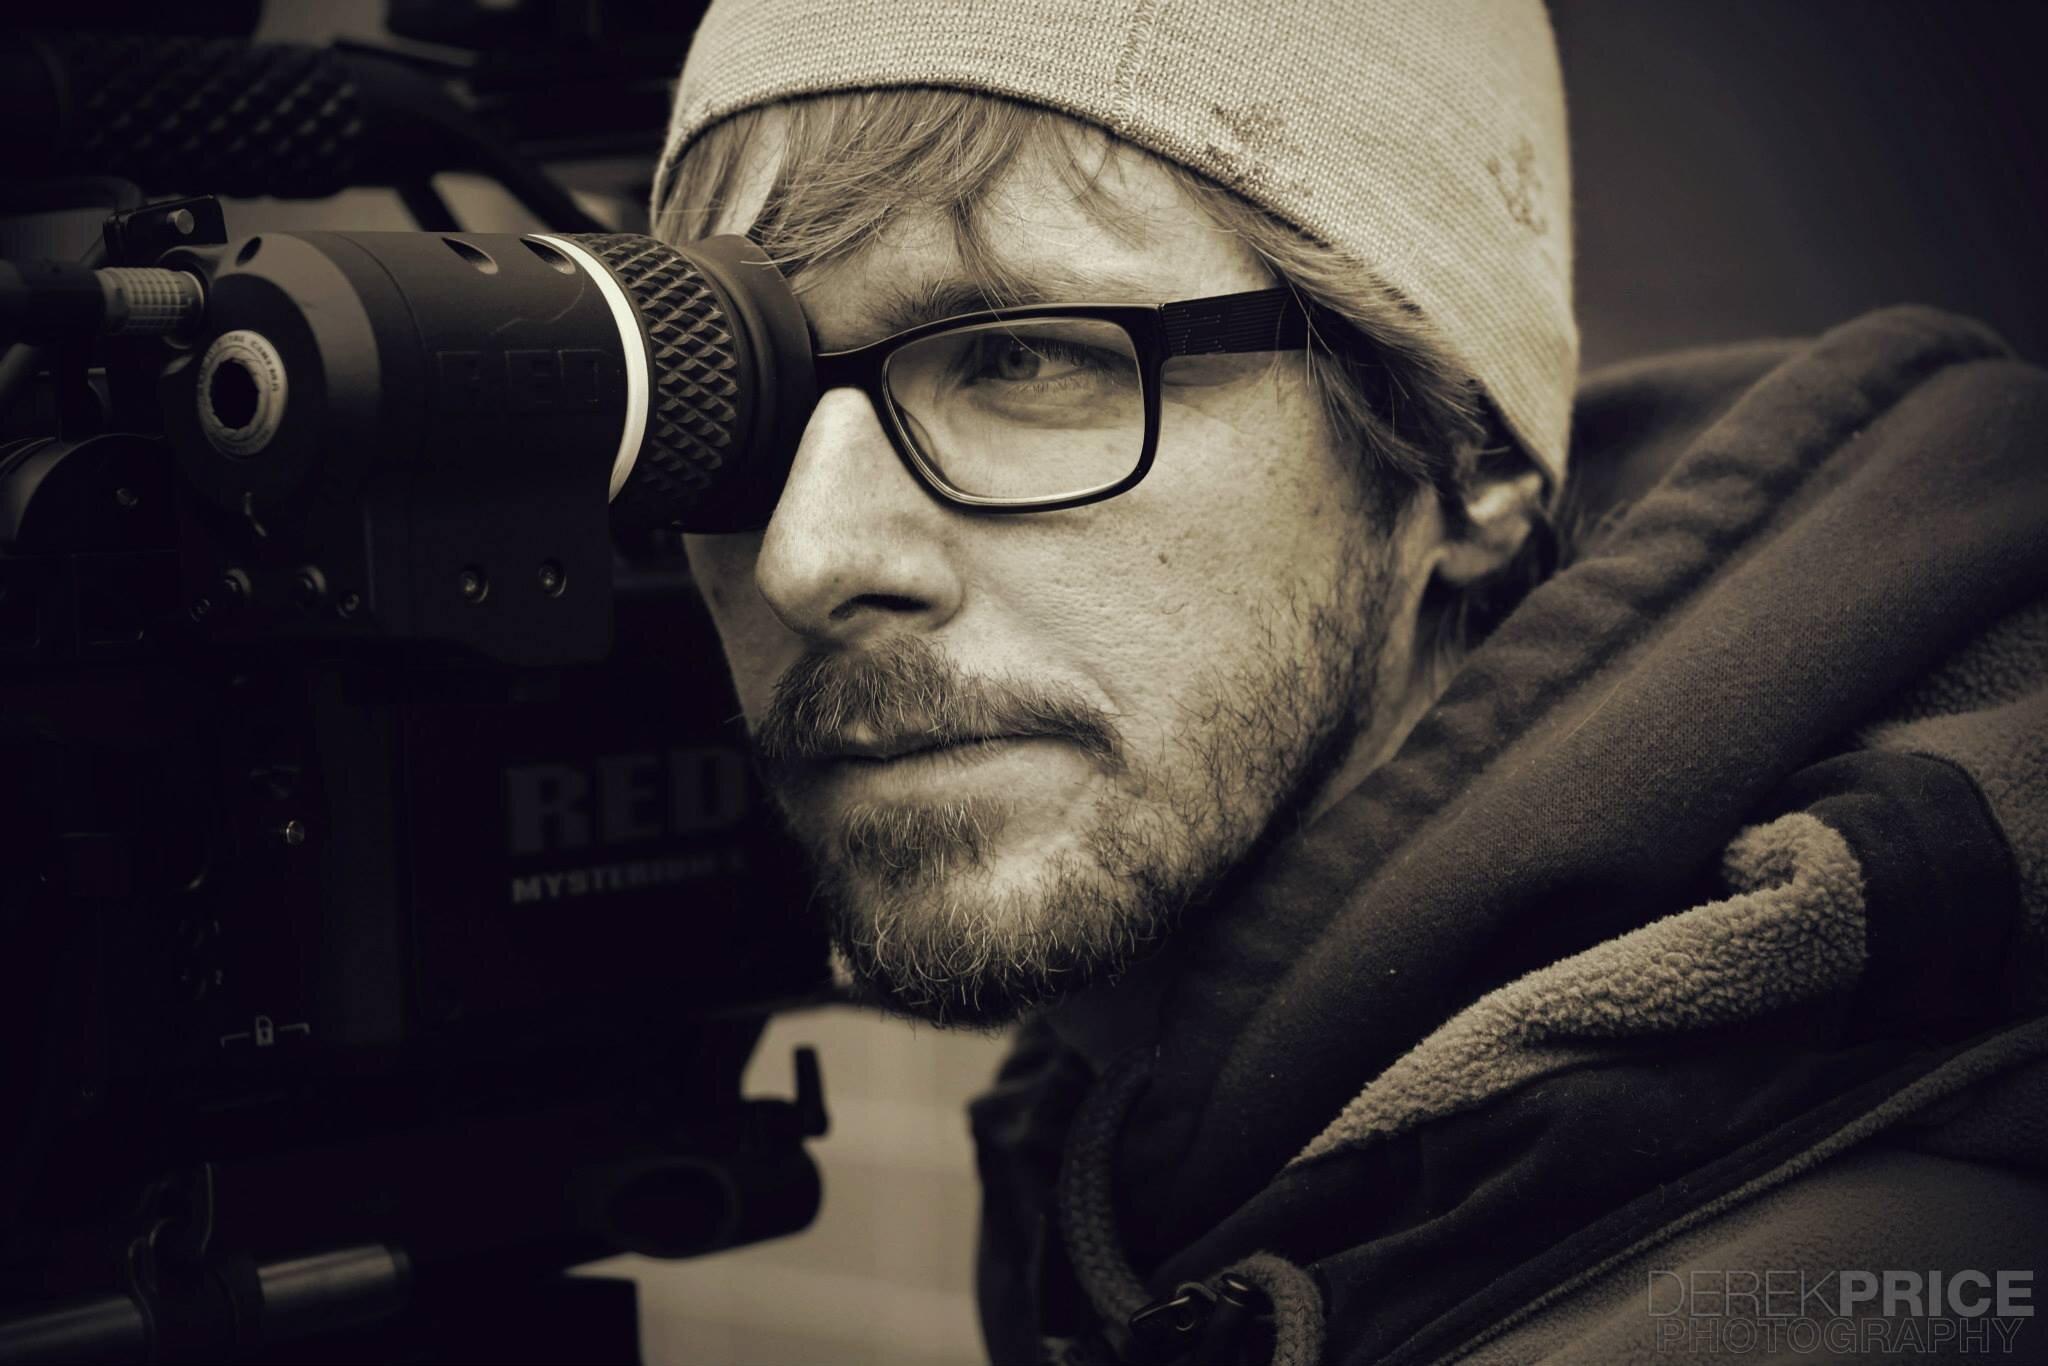 JEREMY KENNEDY - Cinematographer